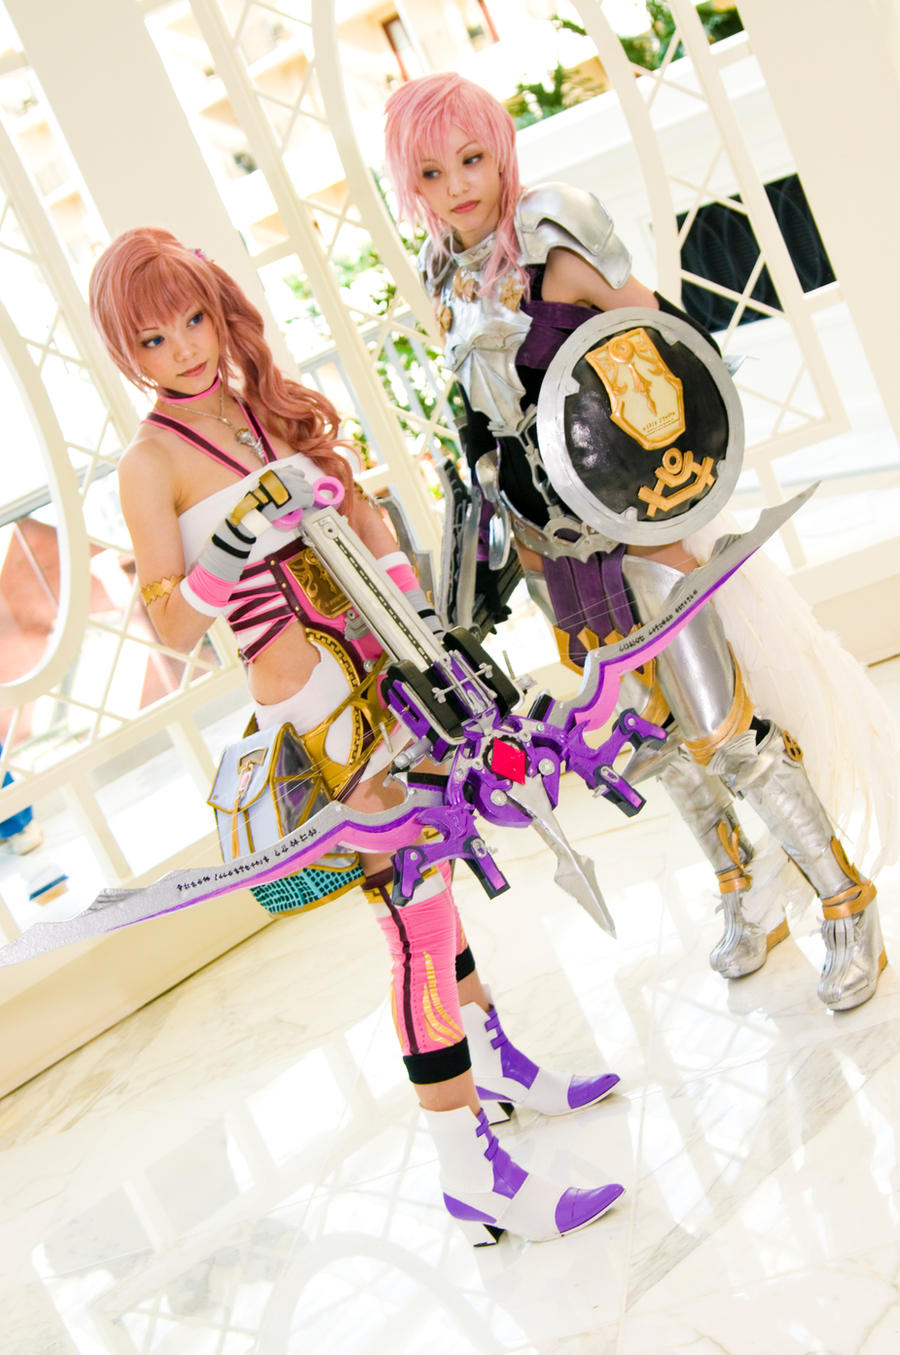 Serah Farron and Lightning, Final Fantasy XIII-2 by EminenceRain